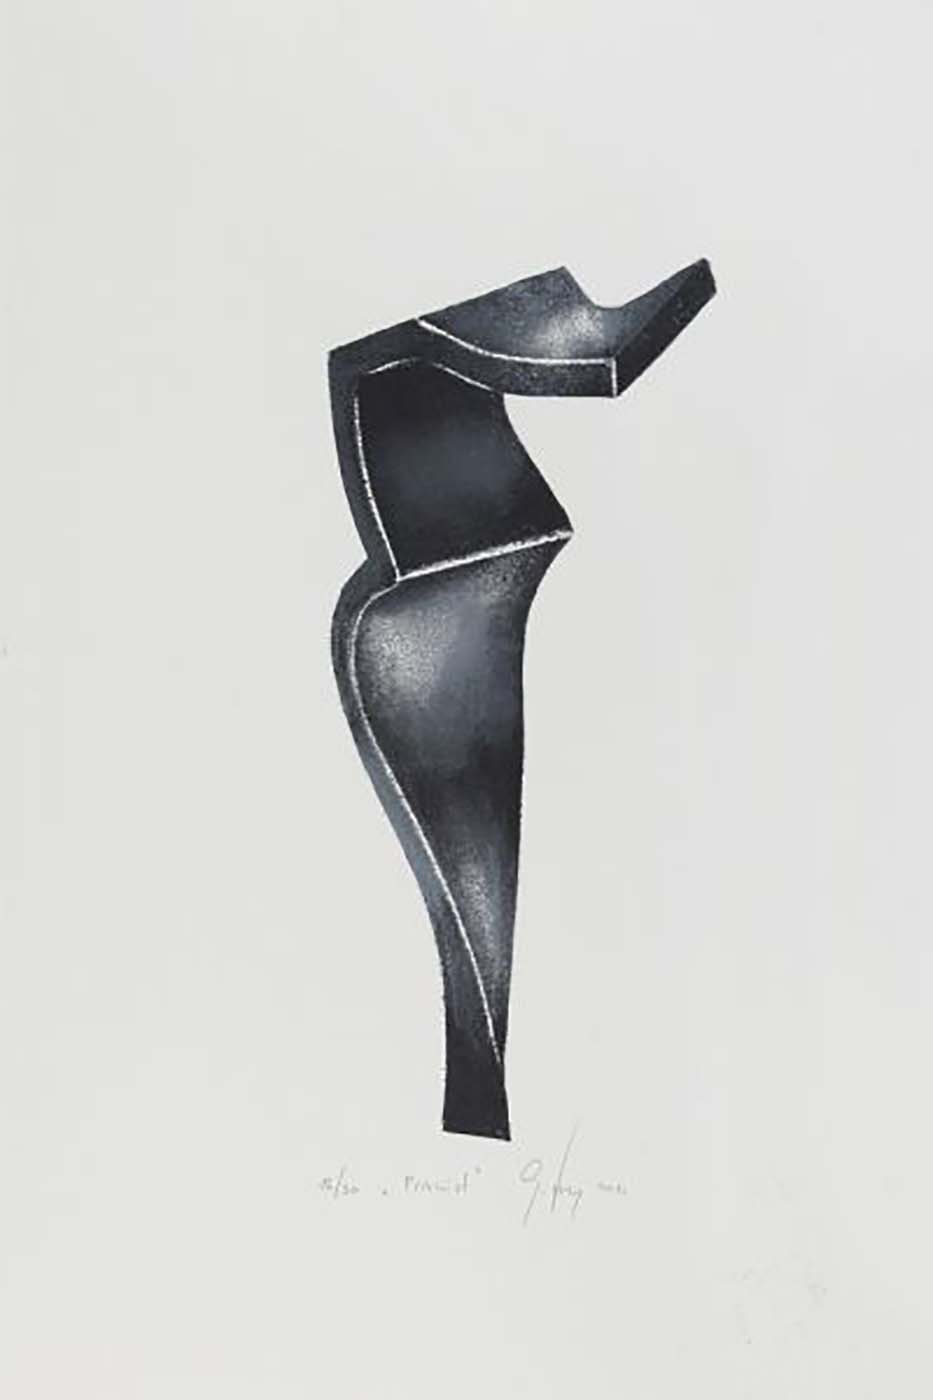 PIANIST, 2012, 27 x 34 cm (k)